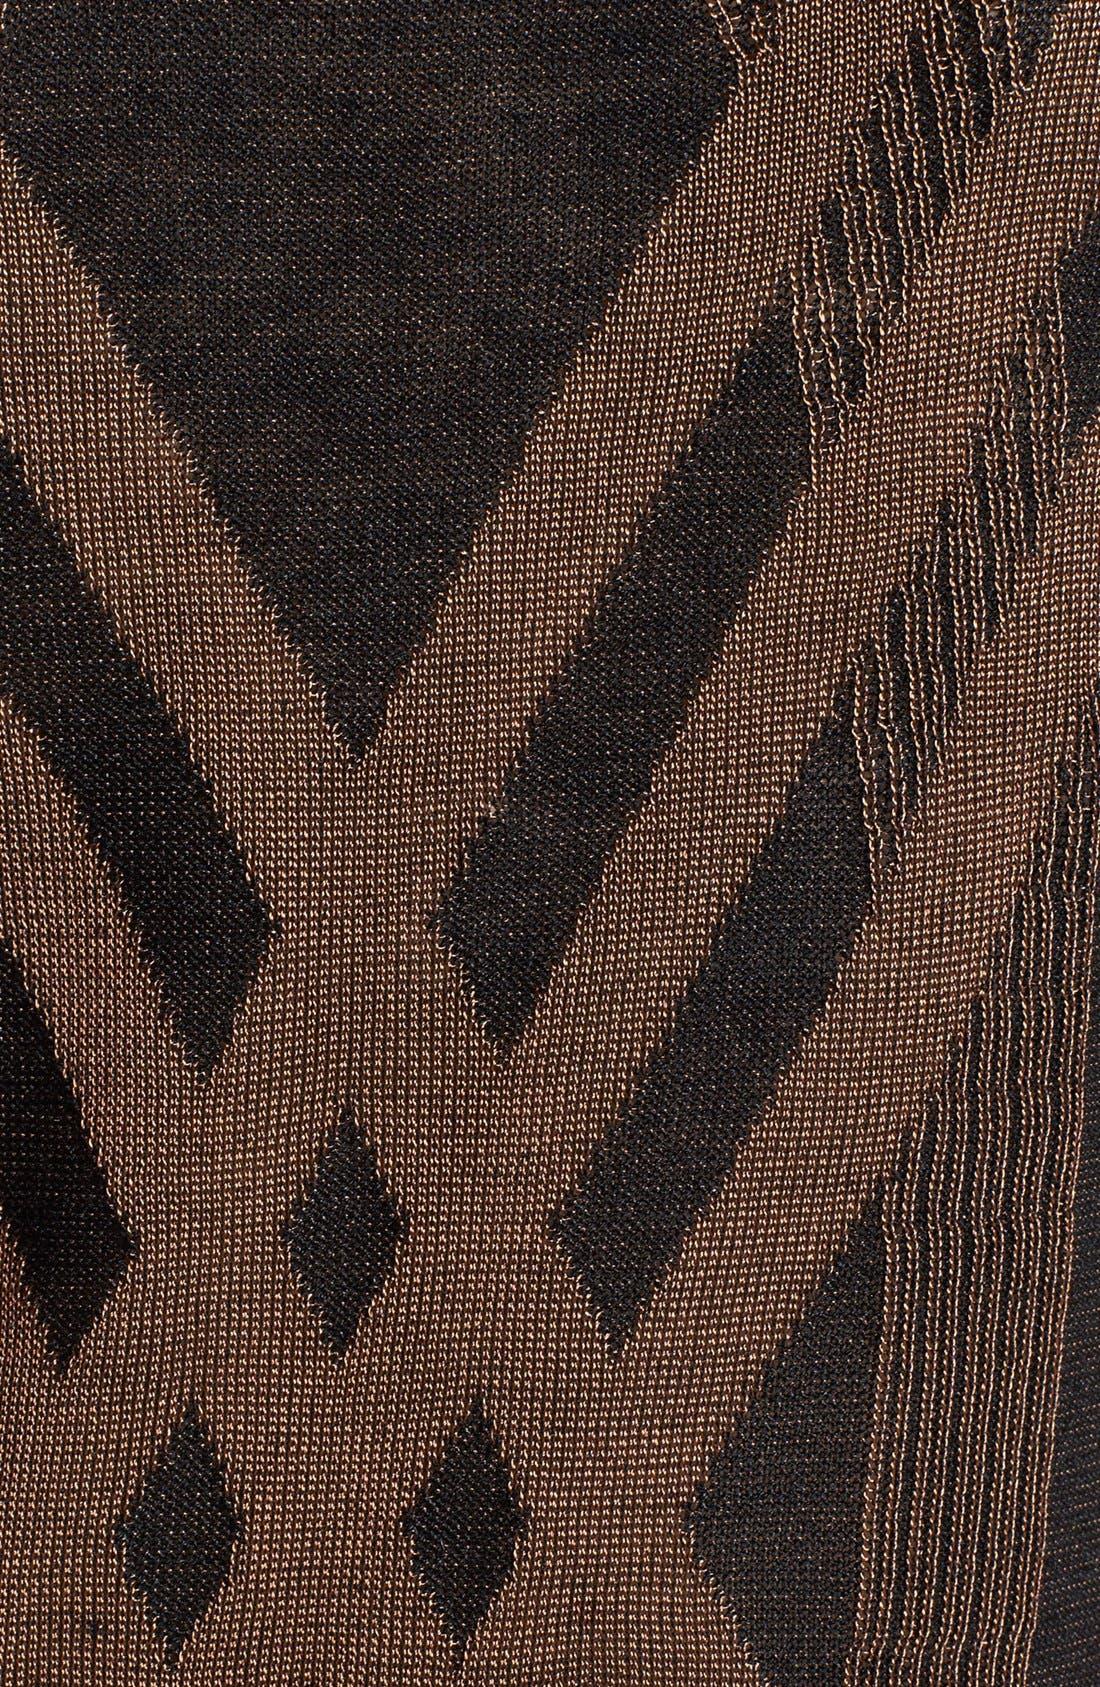 Alternate Image 3  - NIC+ZOE 'Criss Cross' Silk Blend Knit Top